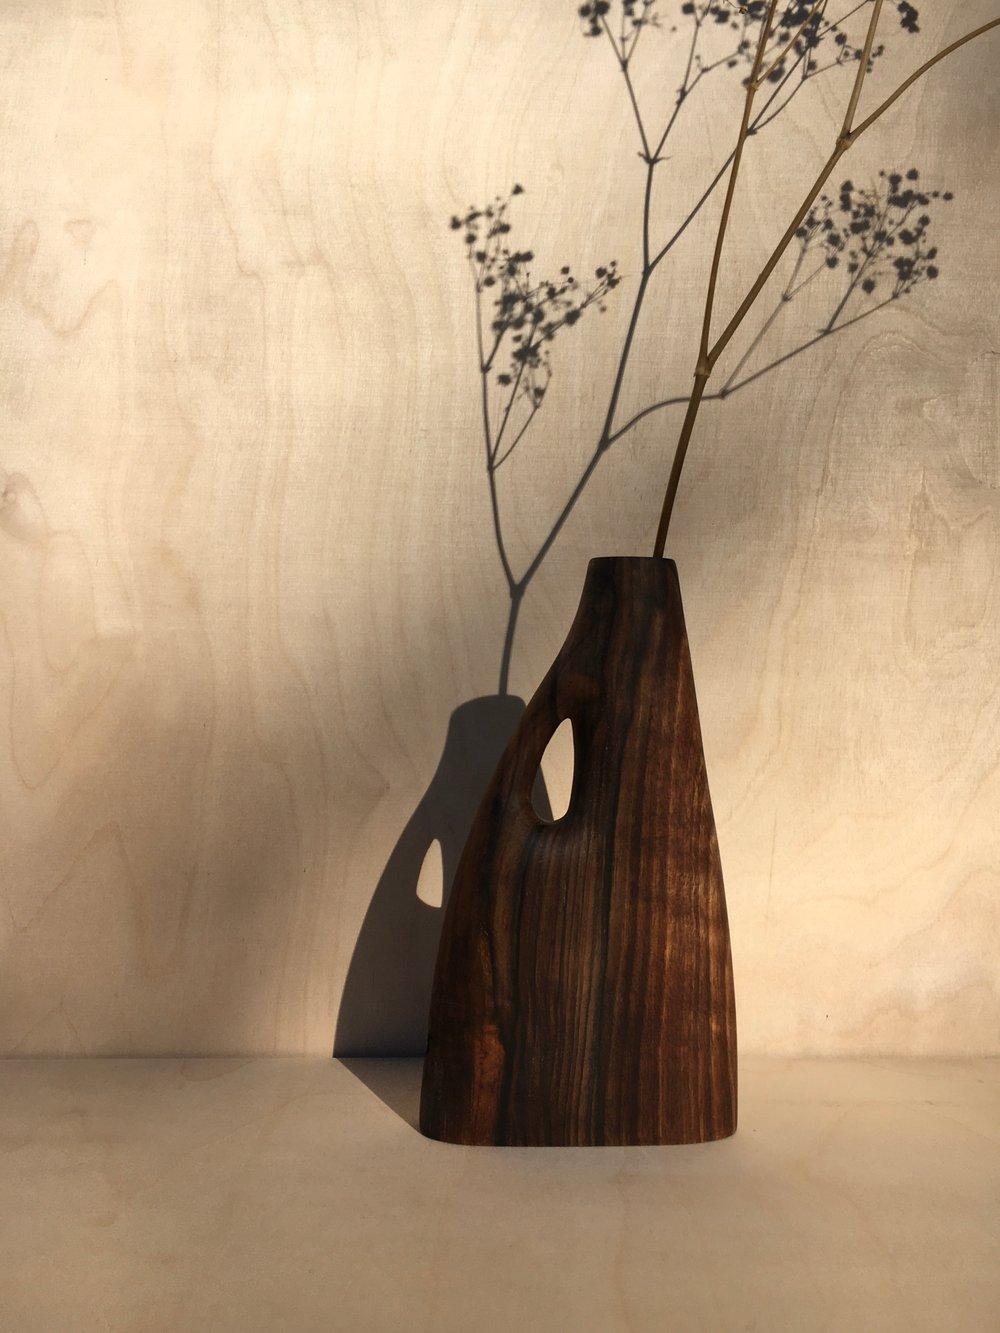 Image of vase #2